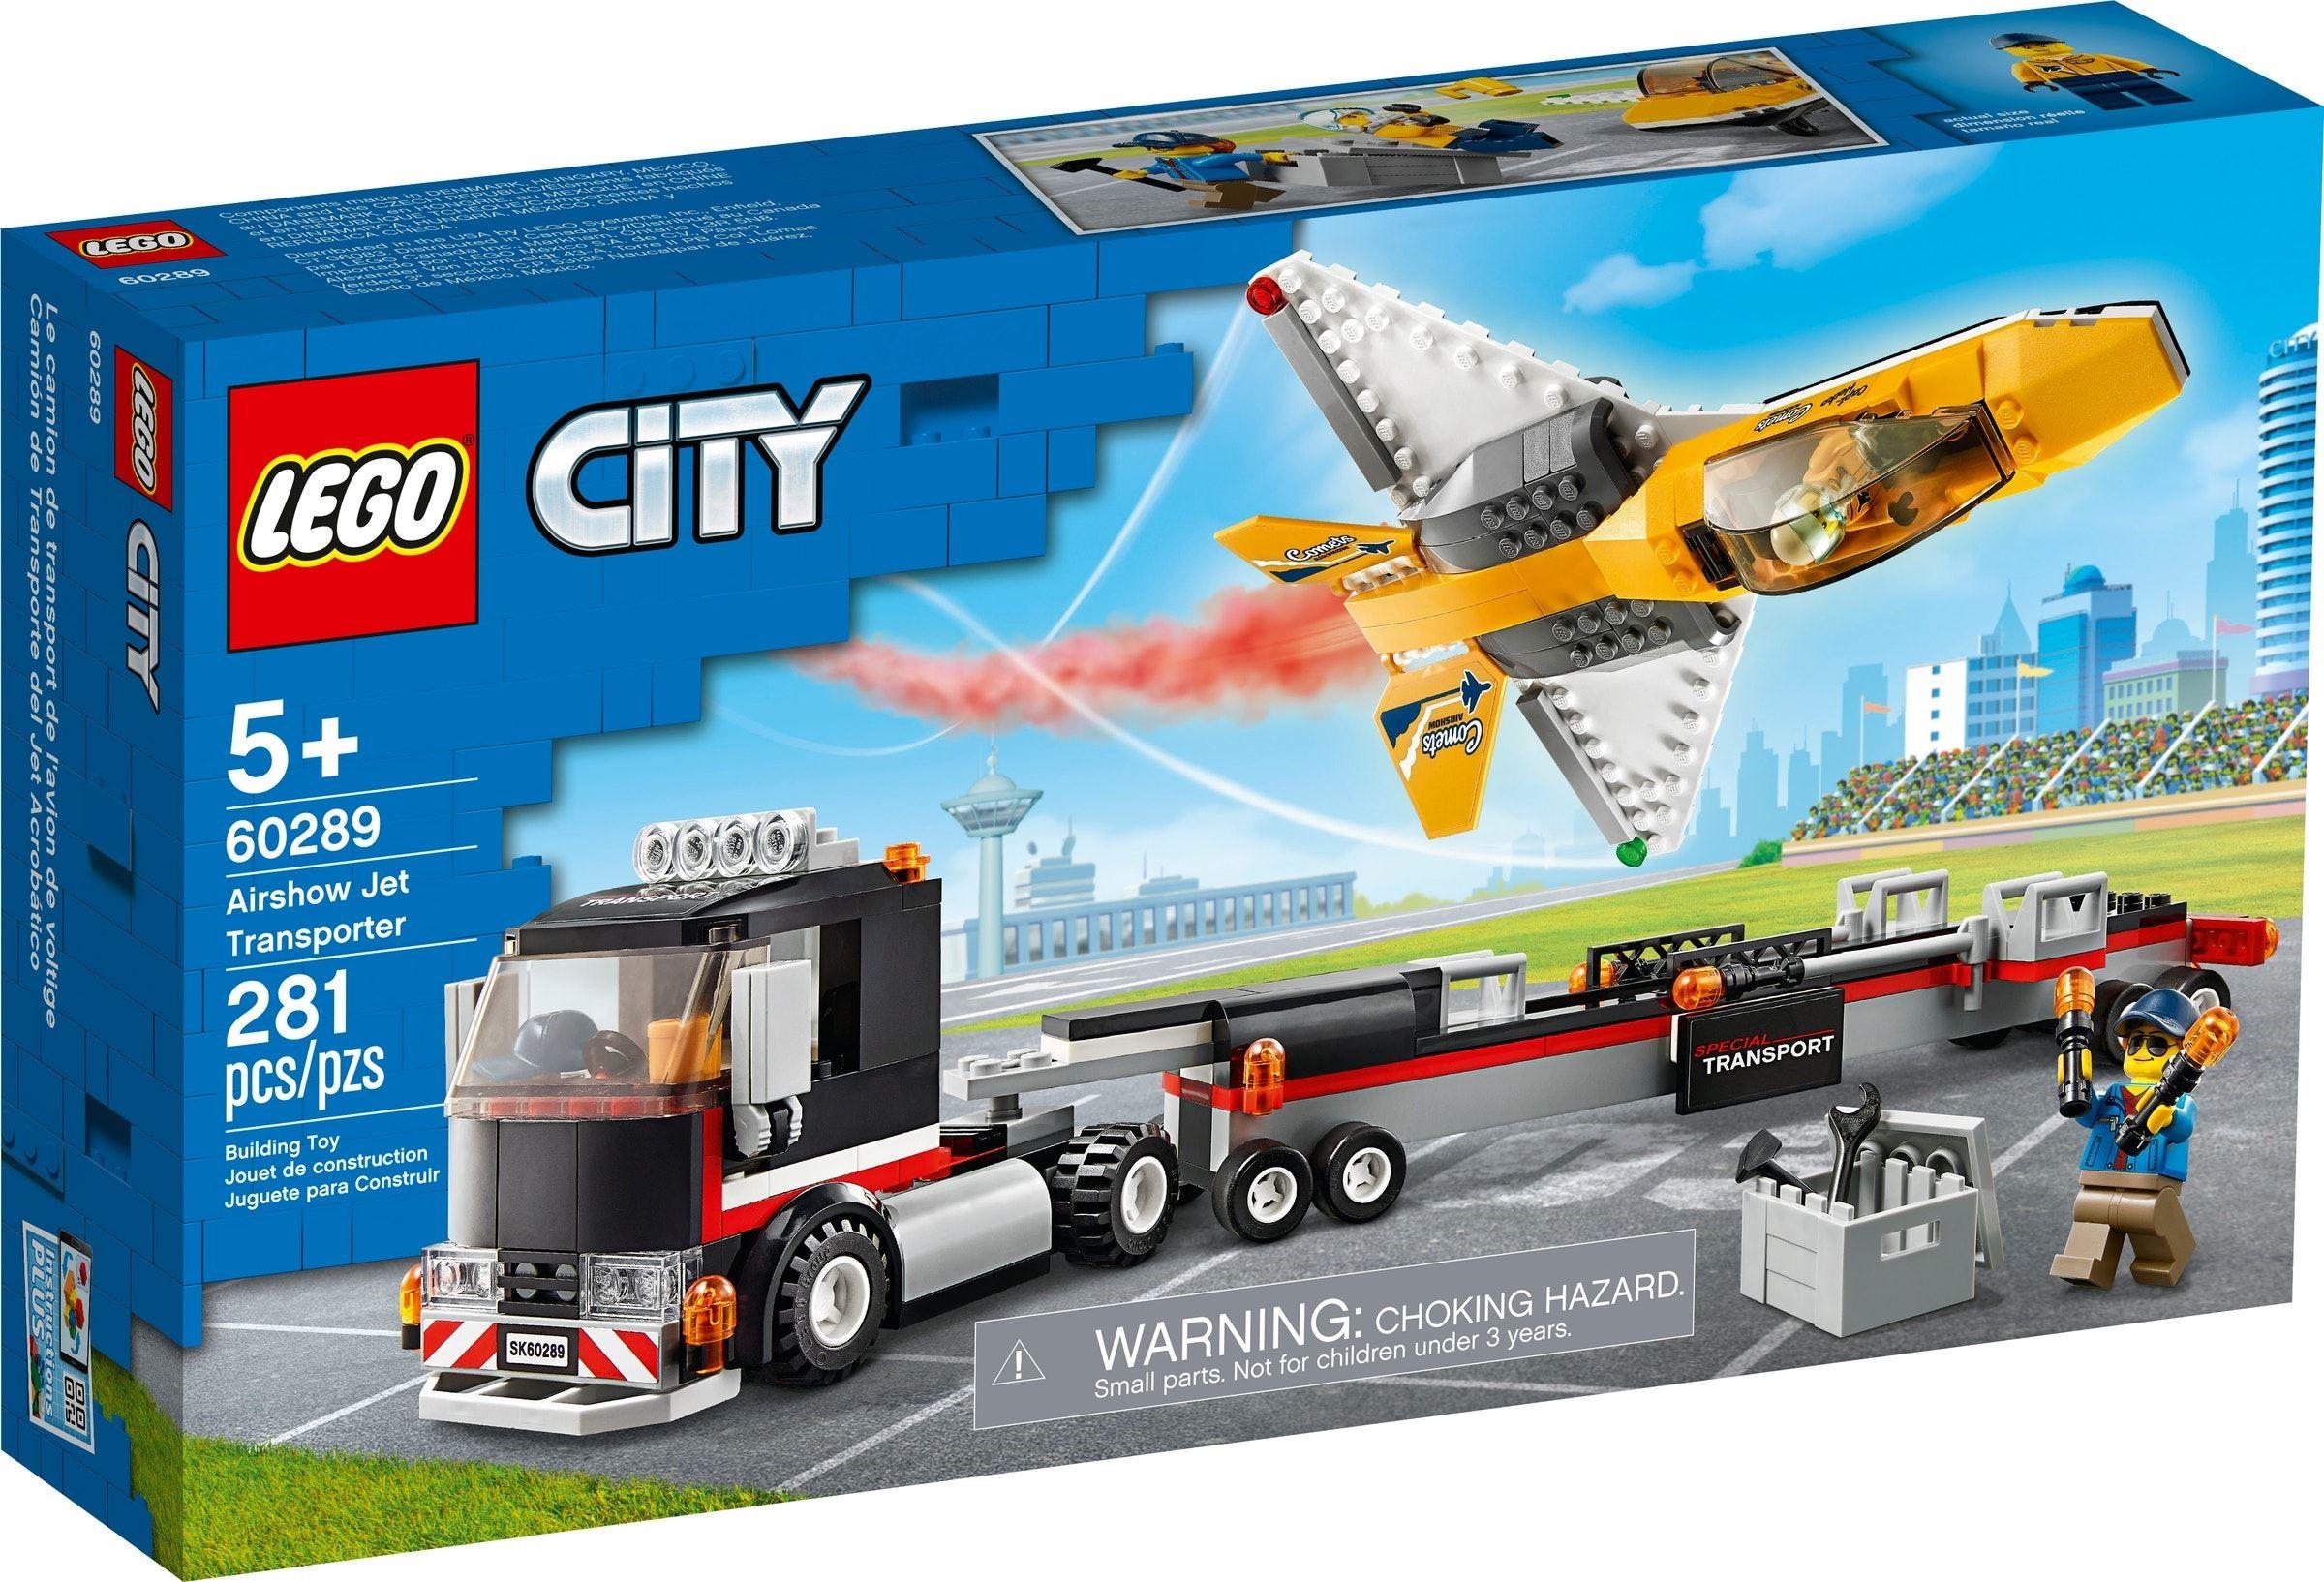 LEGO City - Airshow Jet Transporter (60289)